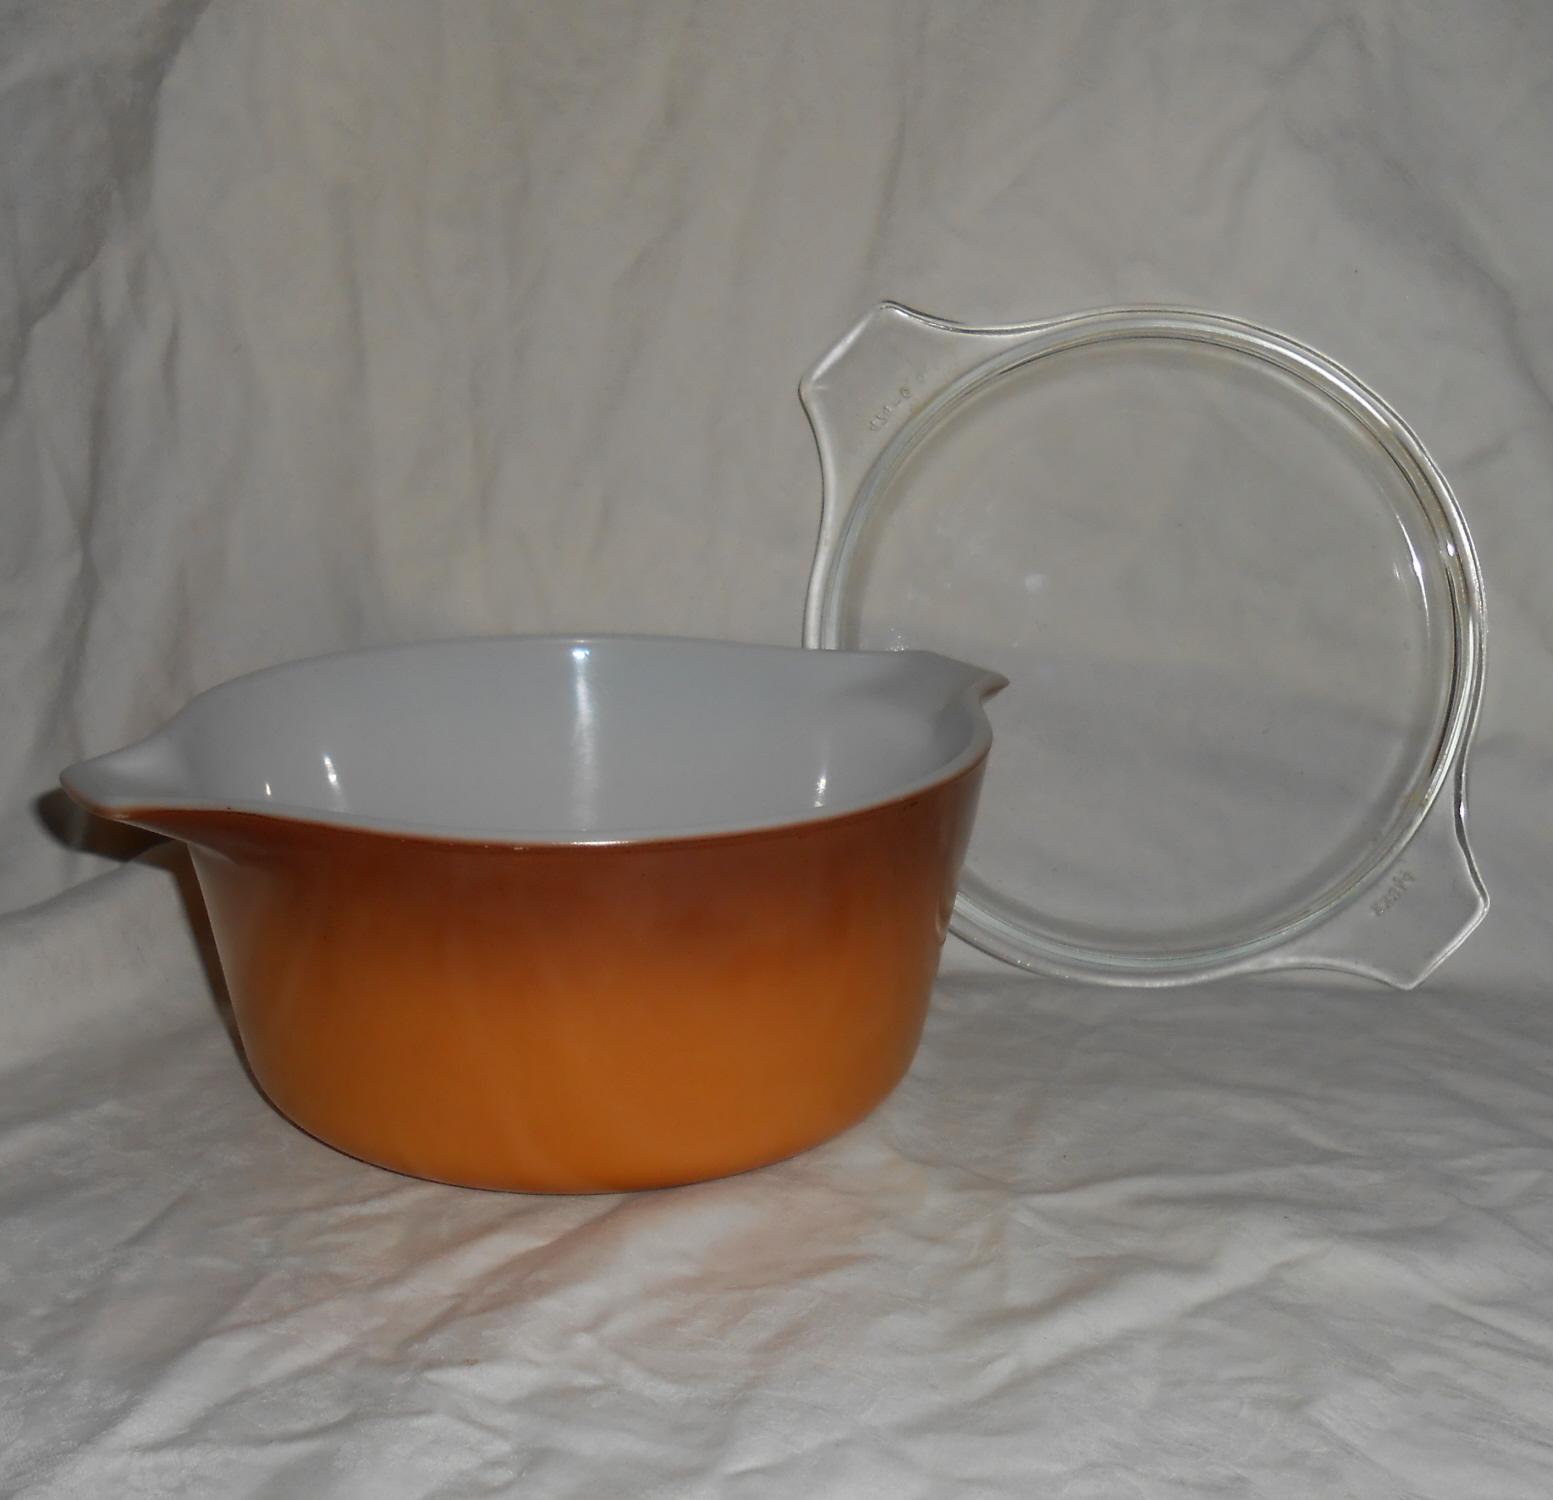 PYREX #474-B Butterscotch 1.5 Quart Old and 50 similar items